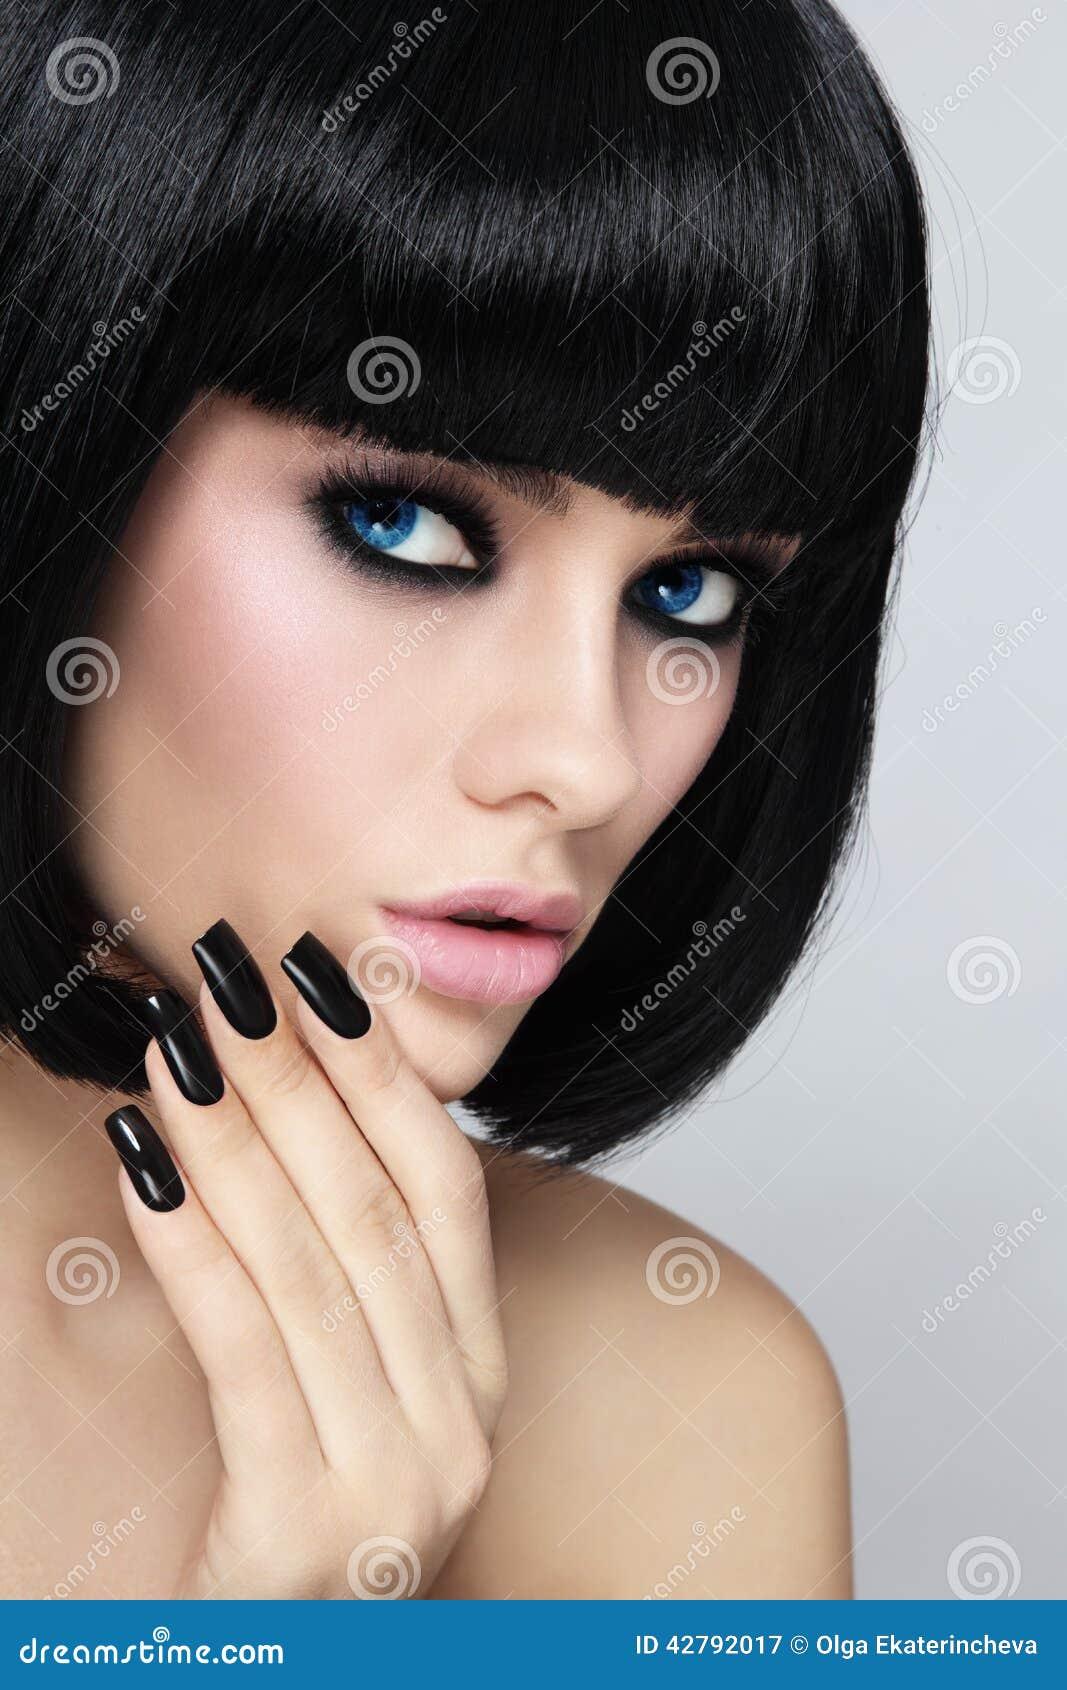 Black Bob And Manicure Stock Image Image Of Lipstick 42792017